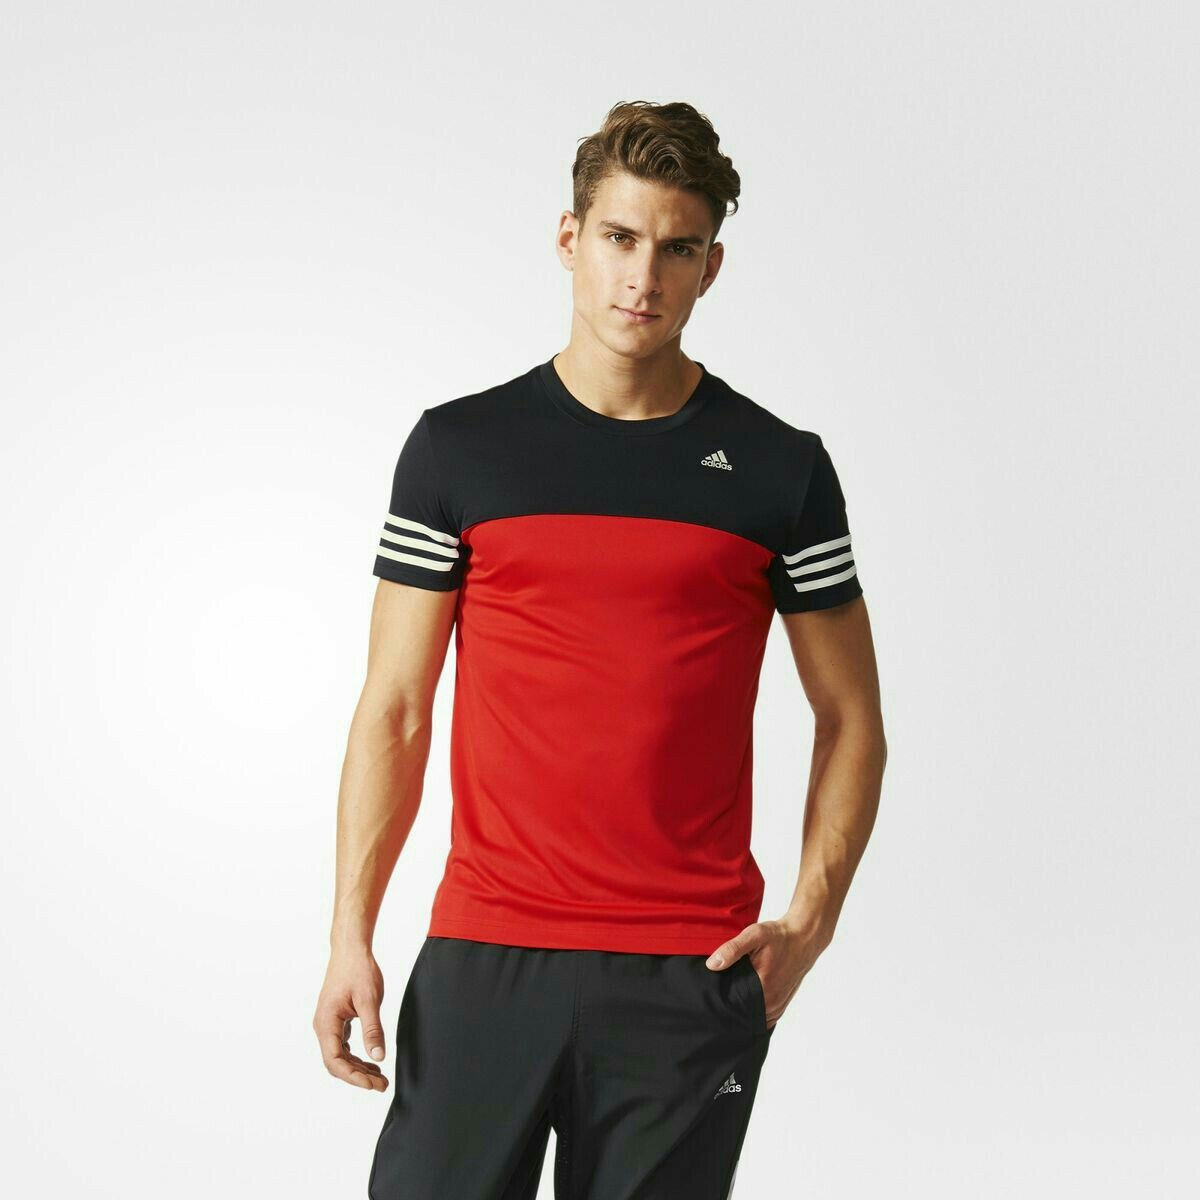 Pin de Luis en poleras Adidas en 2019   Playeras de moda